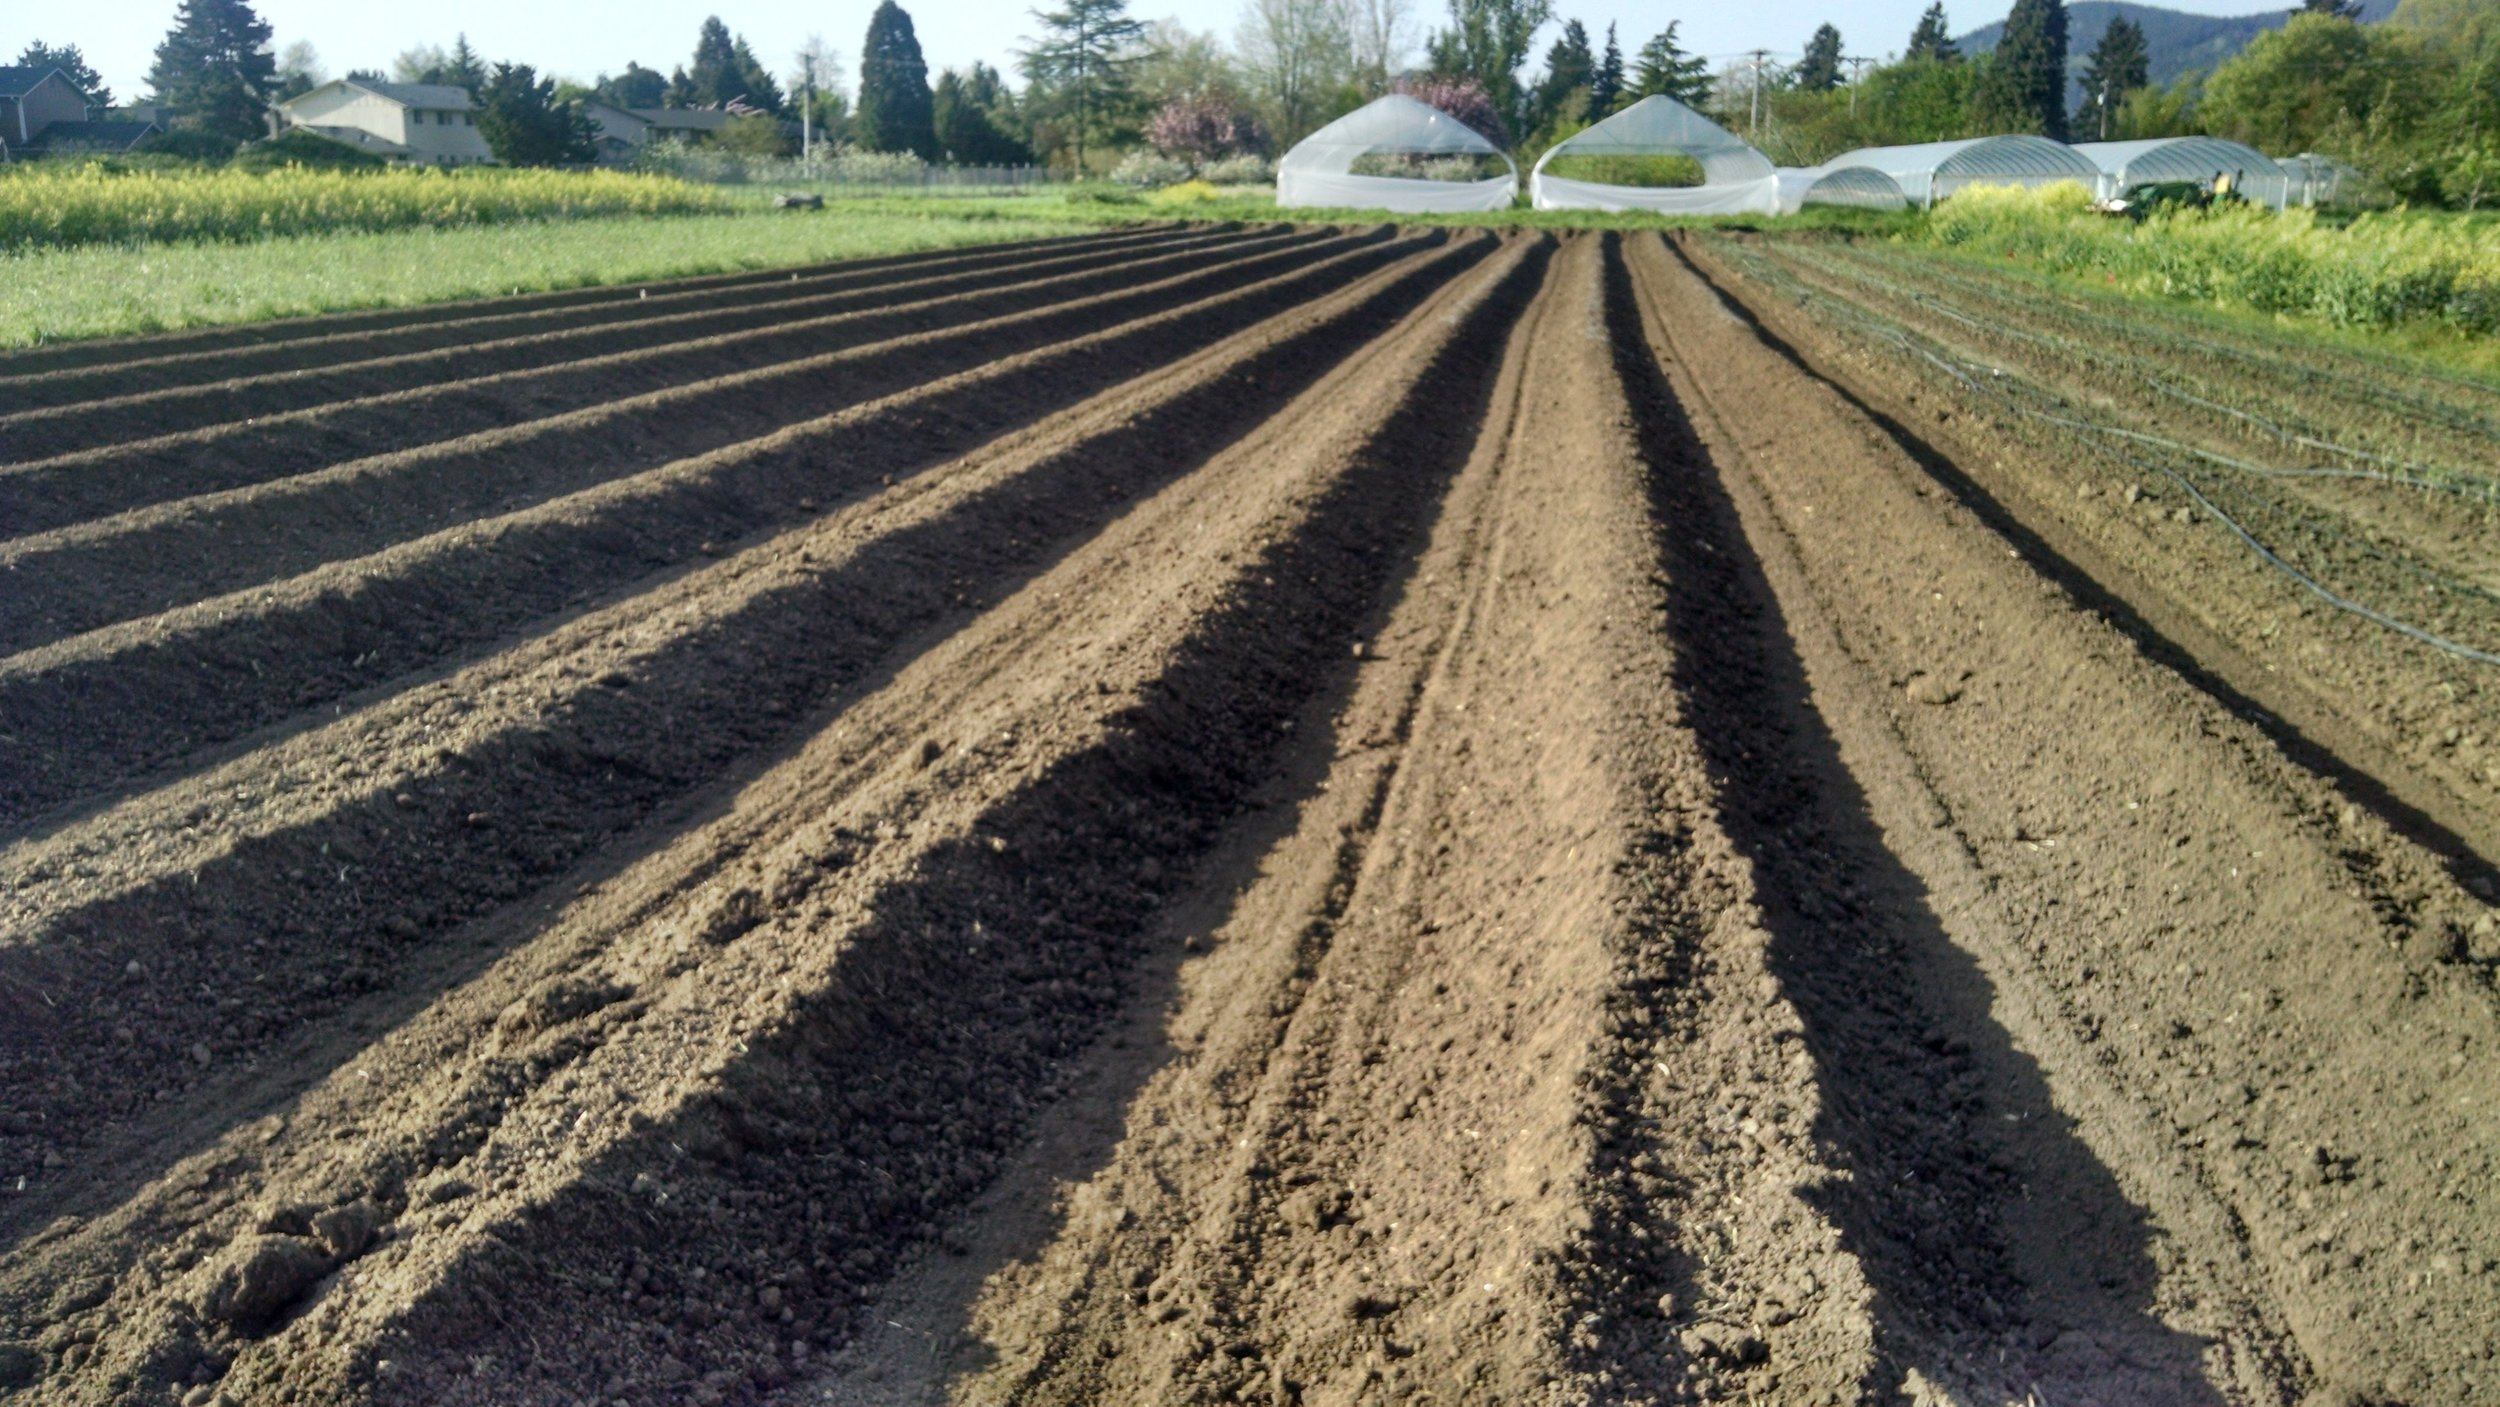 Onion beds awaiting soil amendments